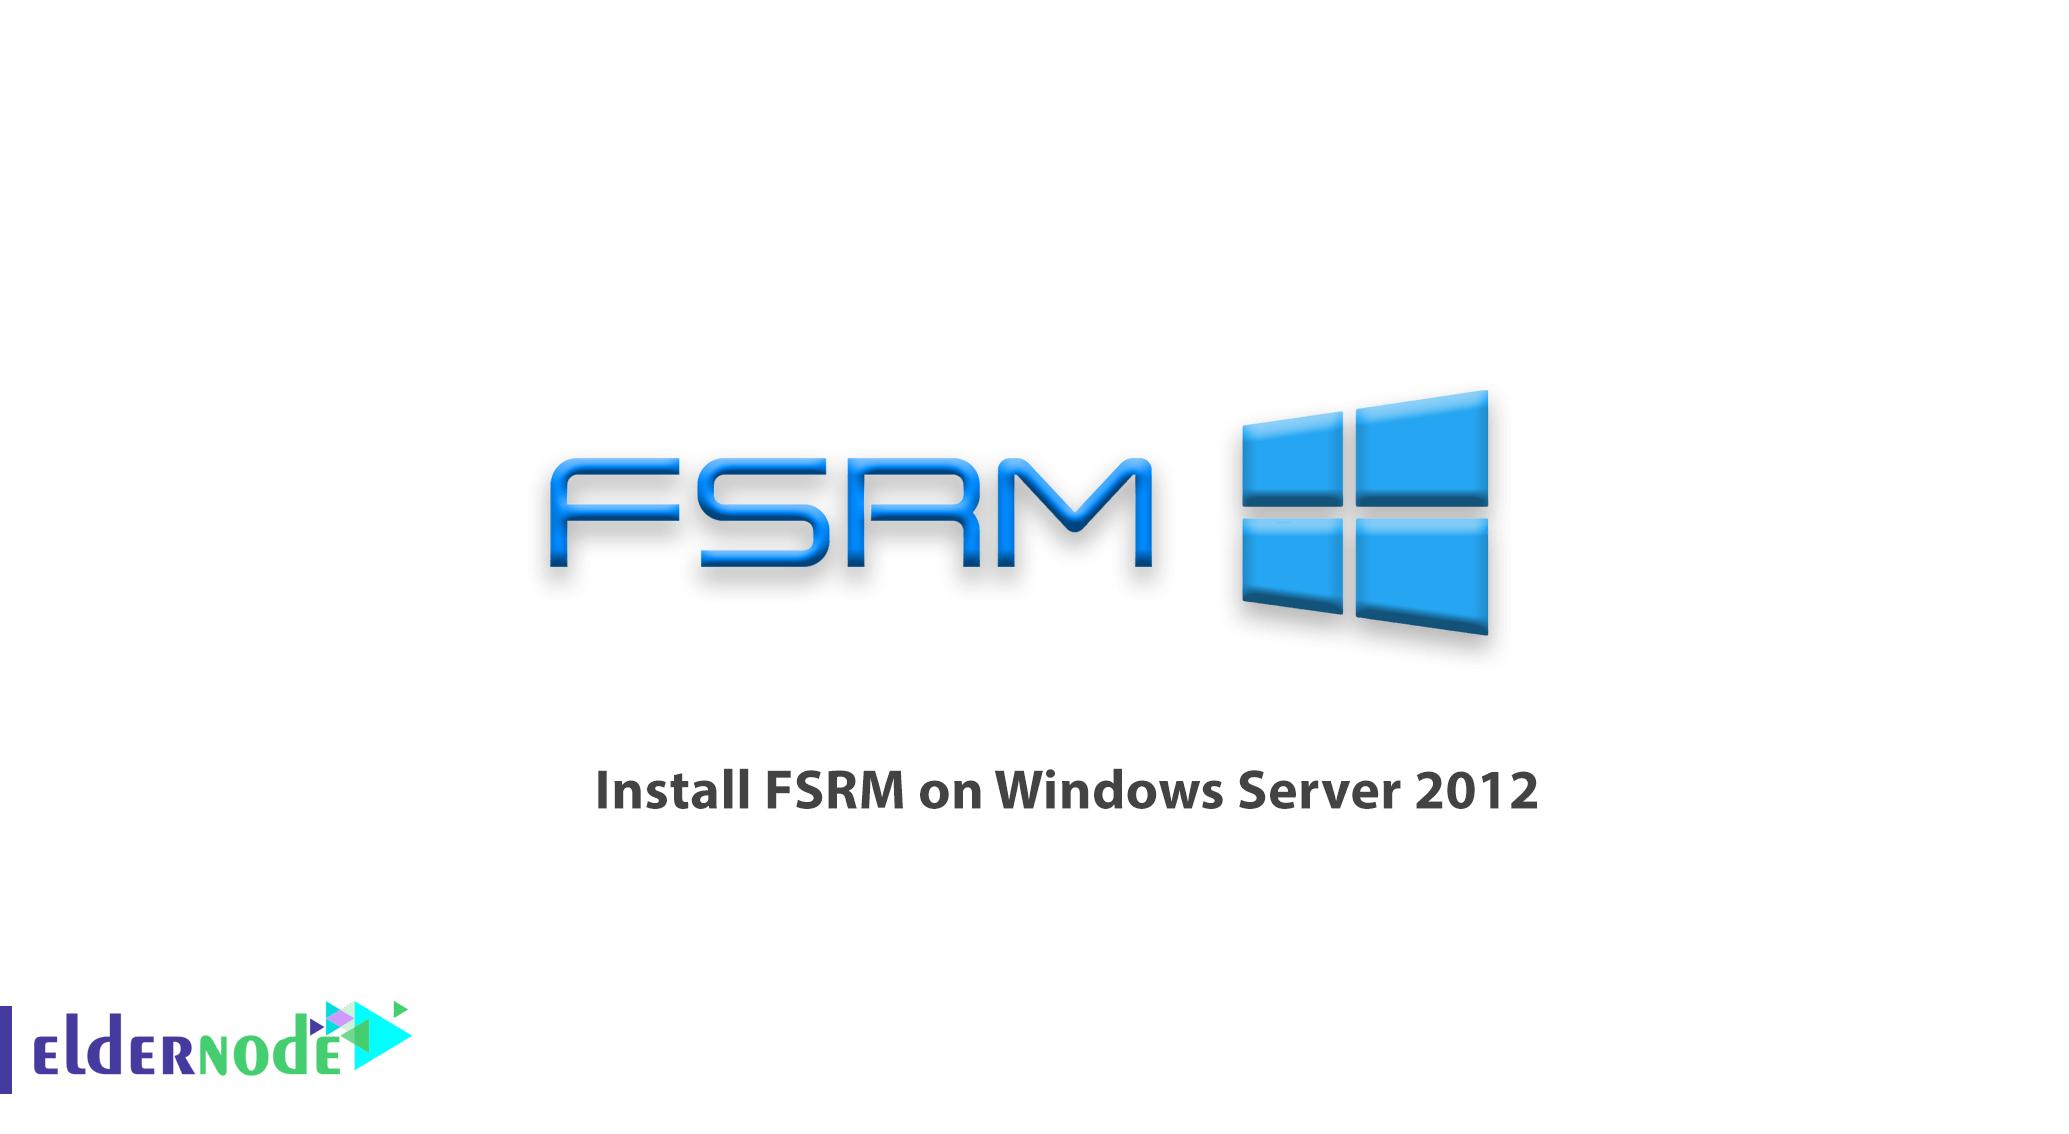 How to install FSRM on Windows Server 2012